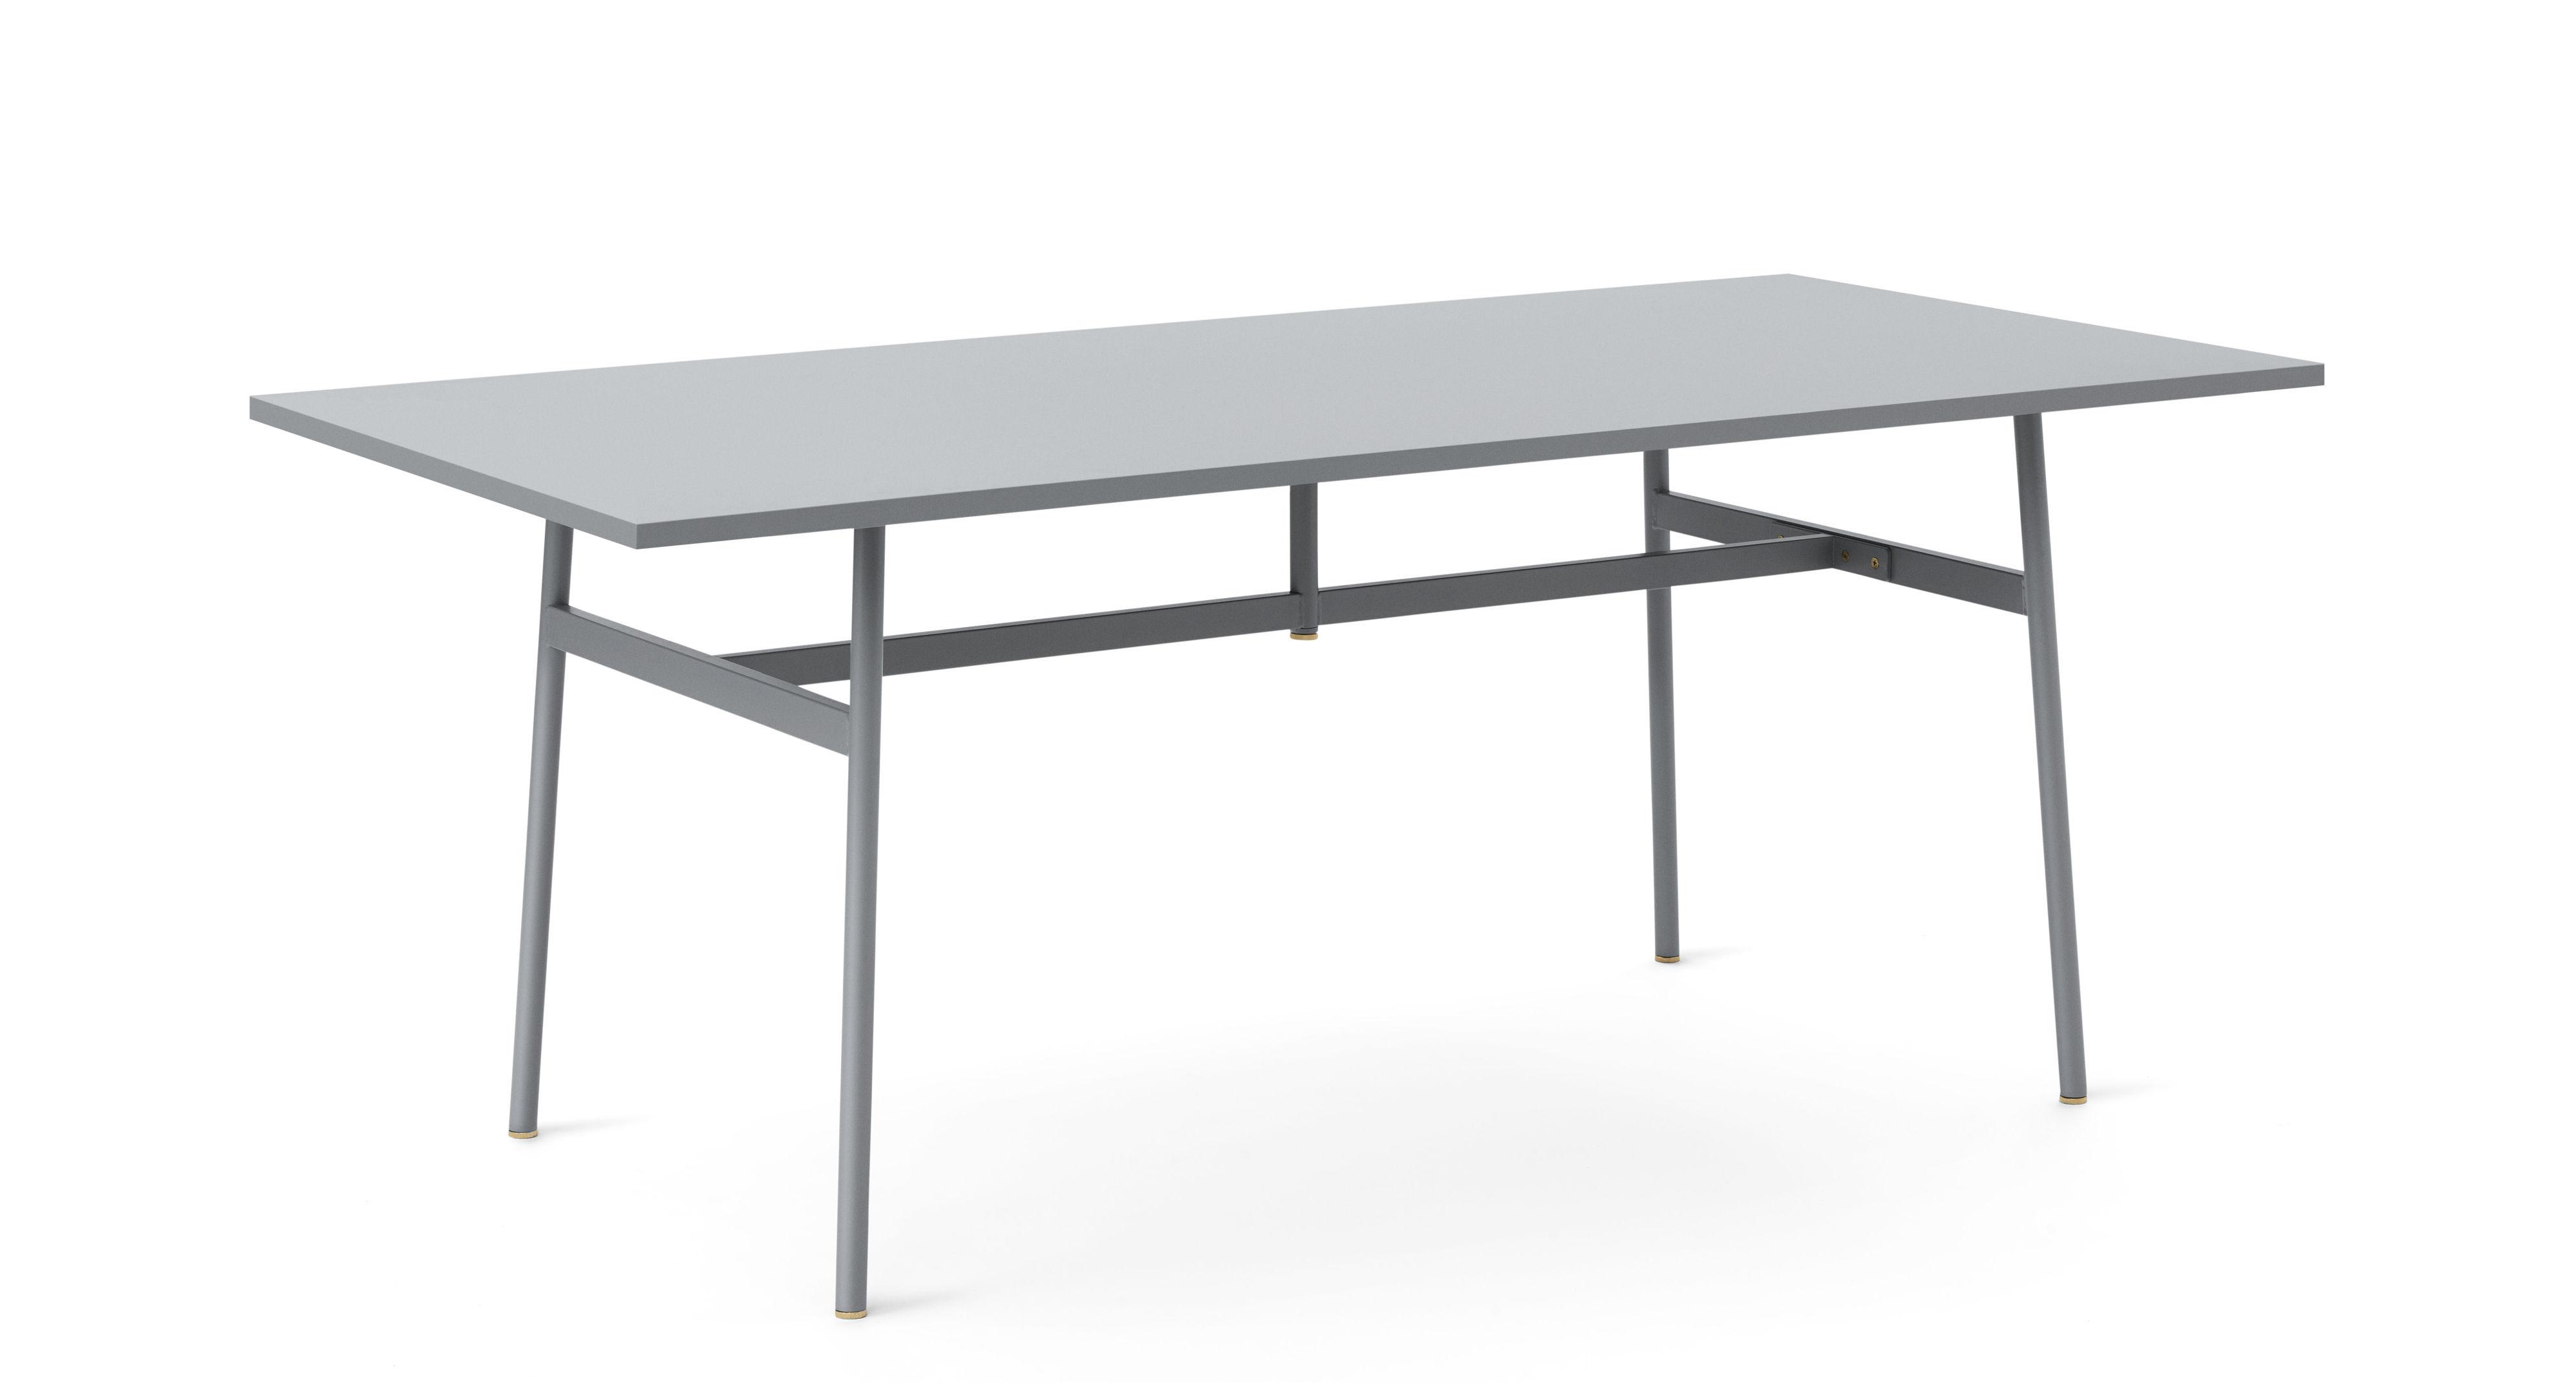 Furniture - Office Furniture - Union Desk - / 180 x 90 cm - Fenix laminate by Normann Copenhagen - Grey - Fenix laminate, Steel